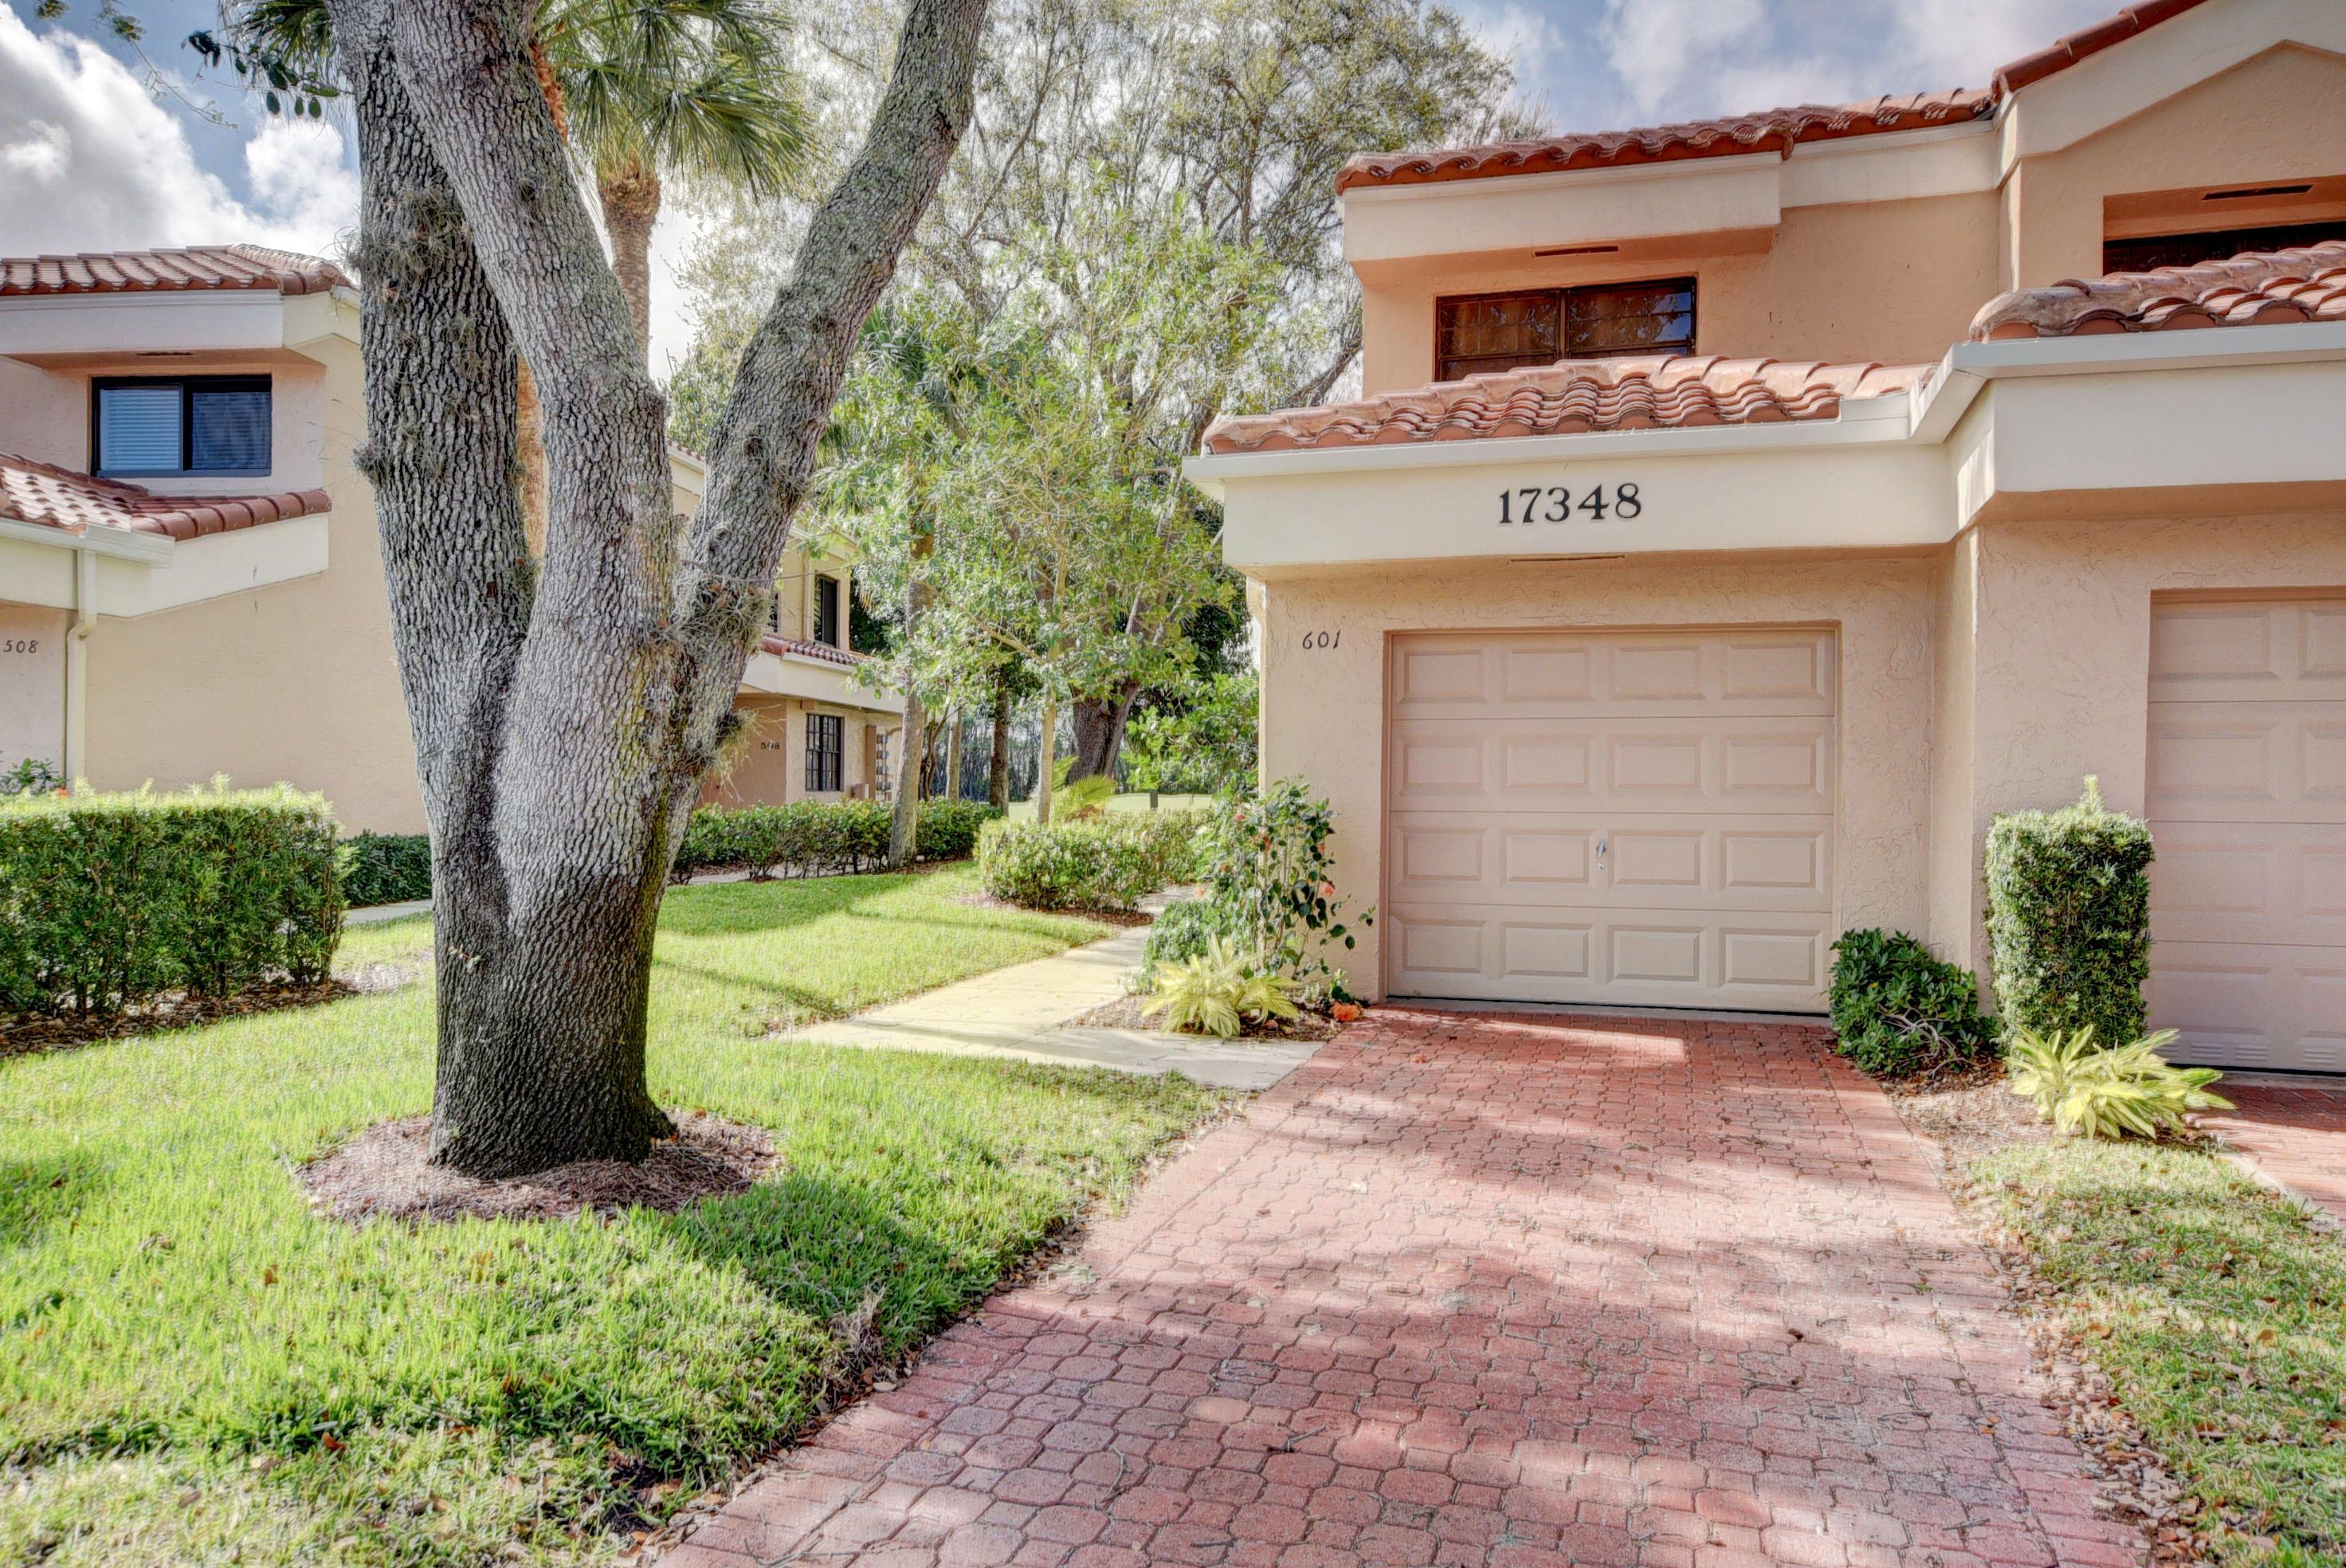 17348 Boca Club Boulevard 601, Boca Raton, FL 33487